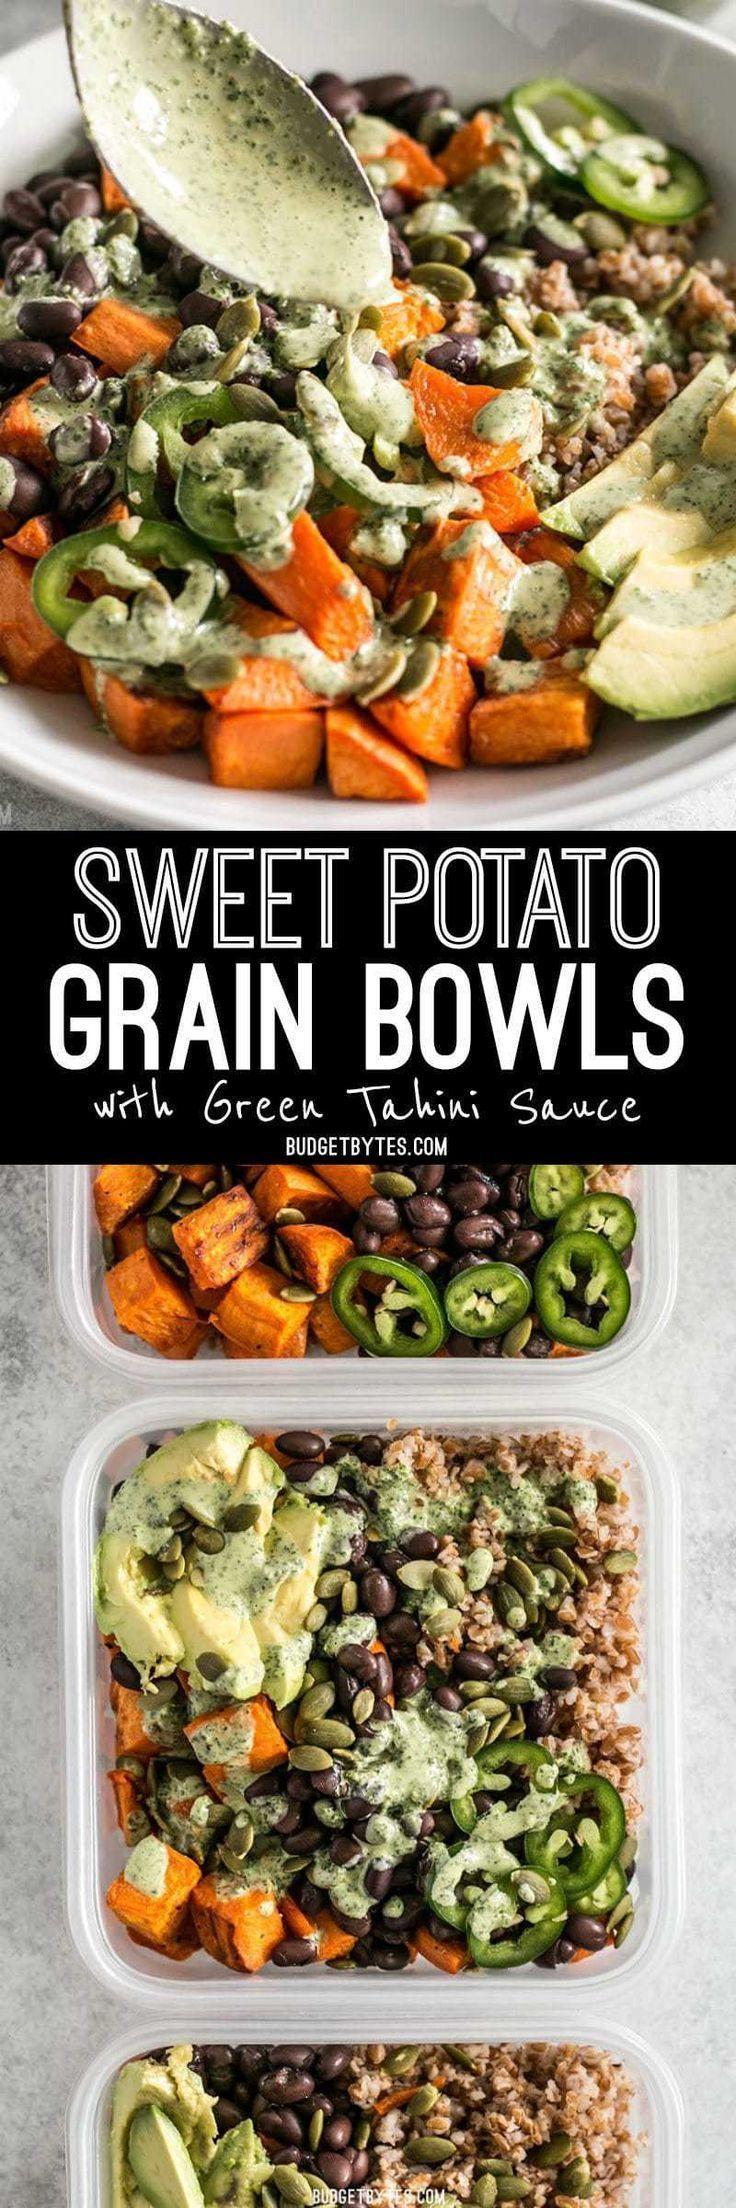 Potato Grain Bowls with Green Tahini Sauce   Sweet Potato Grain Bowls with Green Tahini Sauce  Sweet Potato Grain Bowls with Green Tahini Sauce   Sweet Potato Grain Bowls...